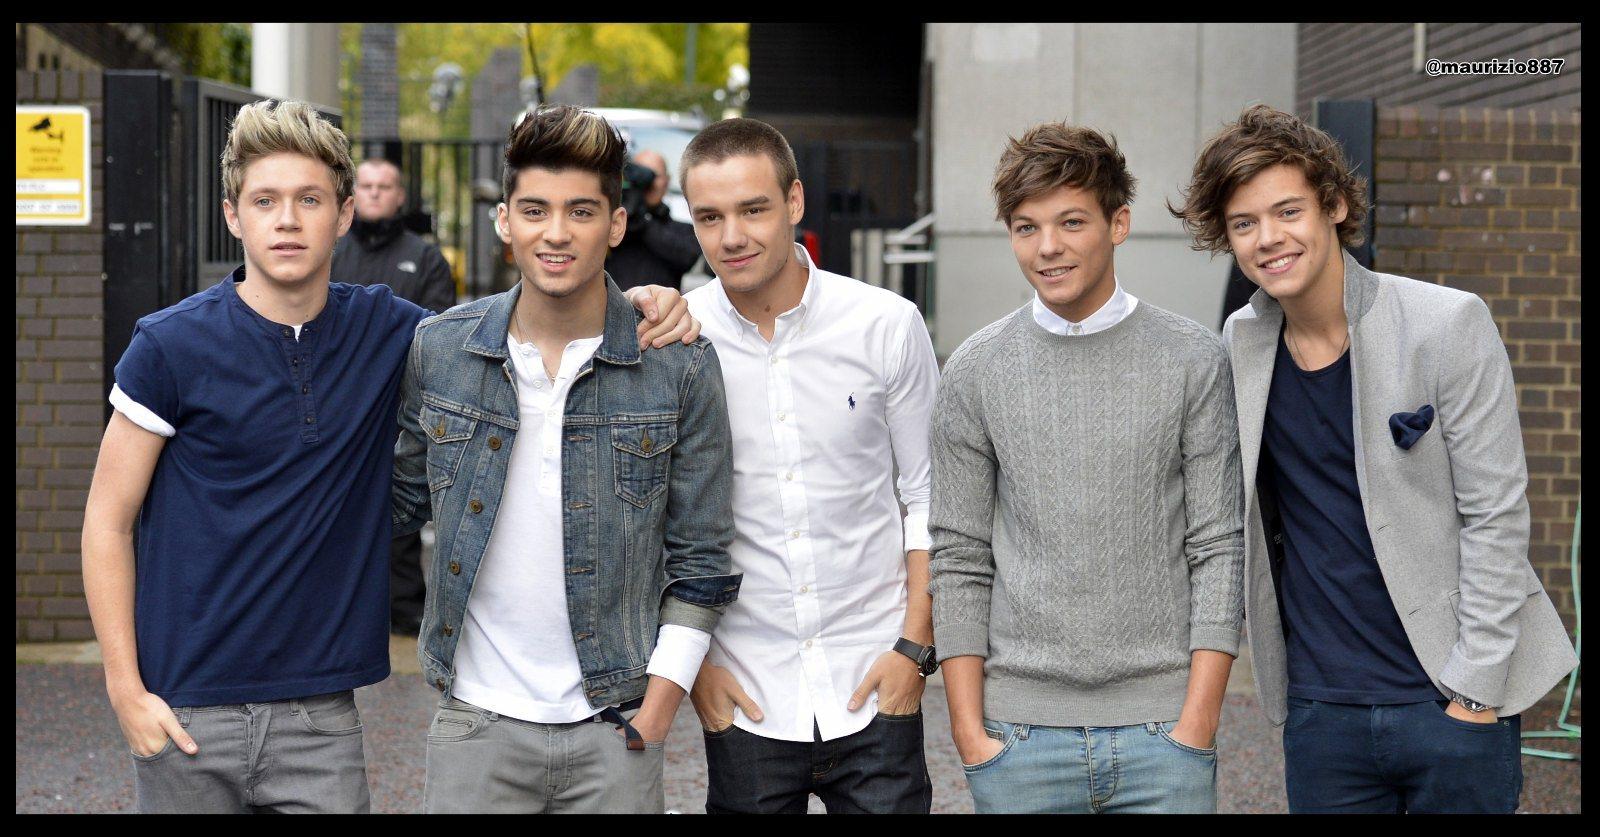 Description One Direction Wallpaper is a hi res Wallpaper for pc 1600x837